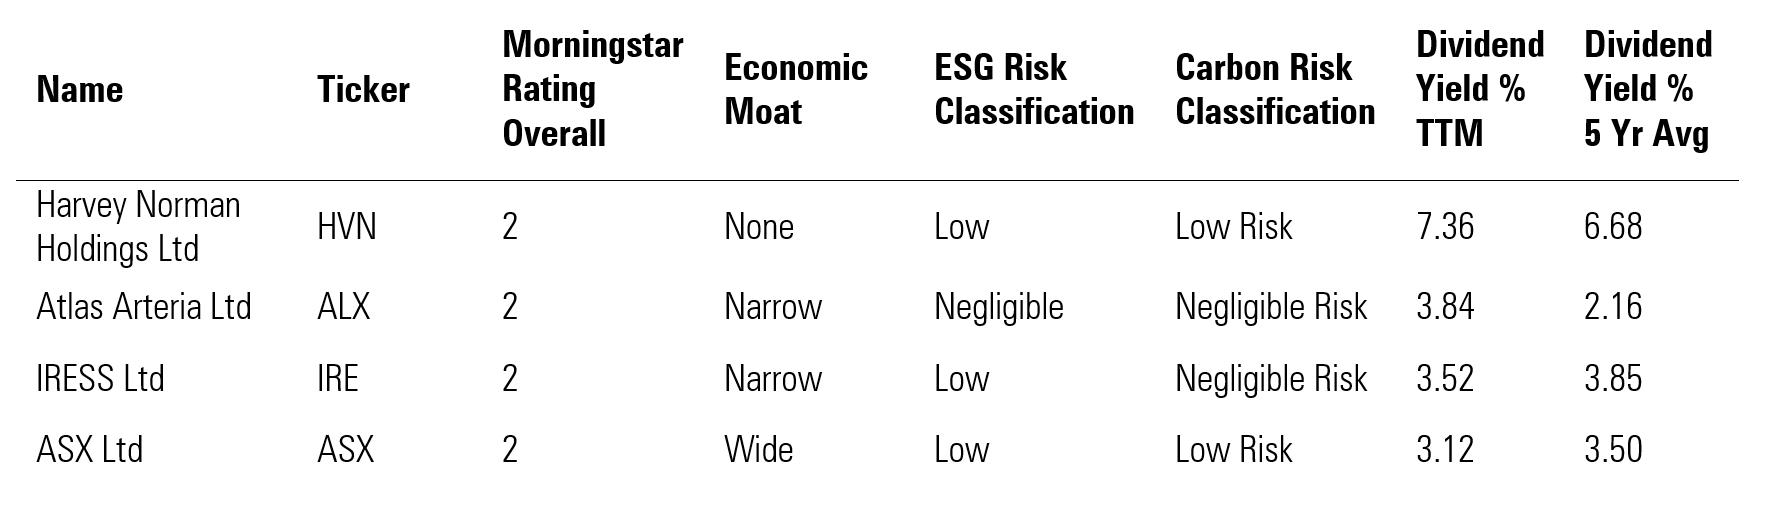 Sustainable picks based on historic dividend performance - premium to fair value